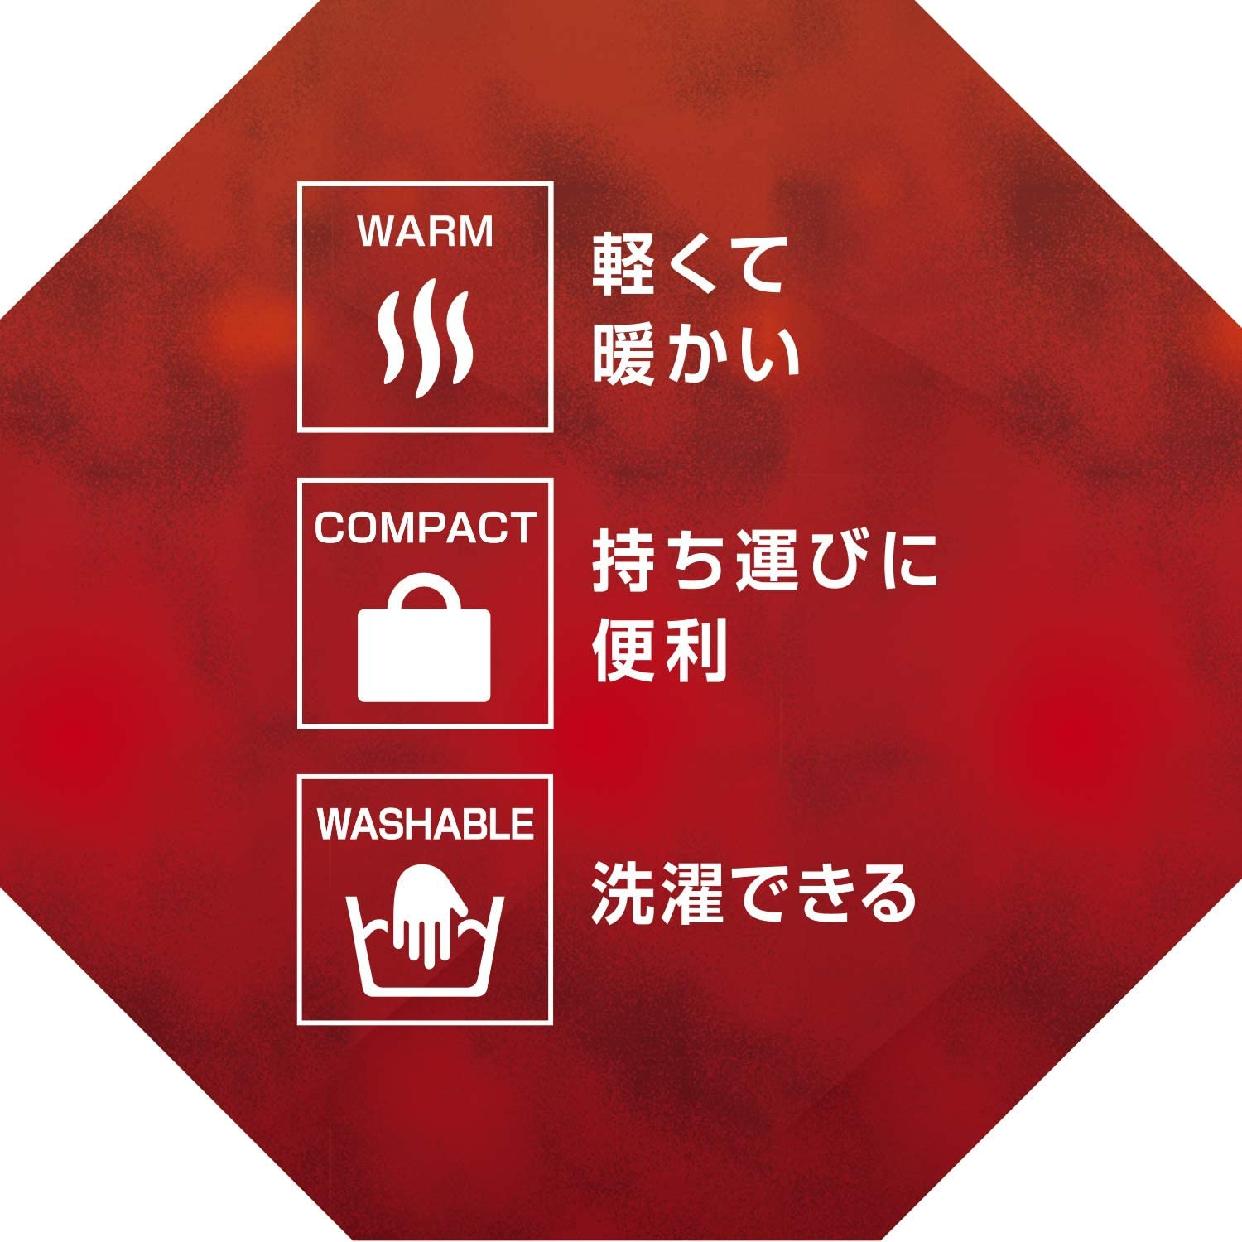 MIZUNO(ミズノ) ルームシューズの商品画像4